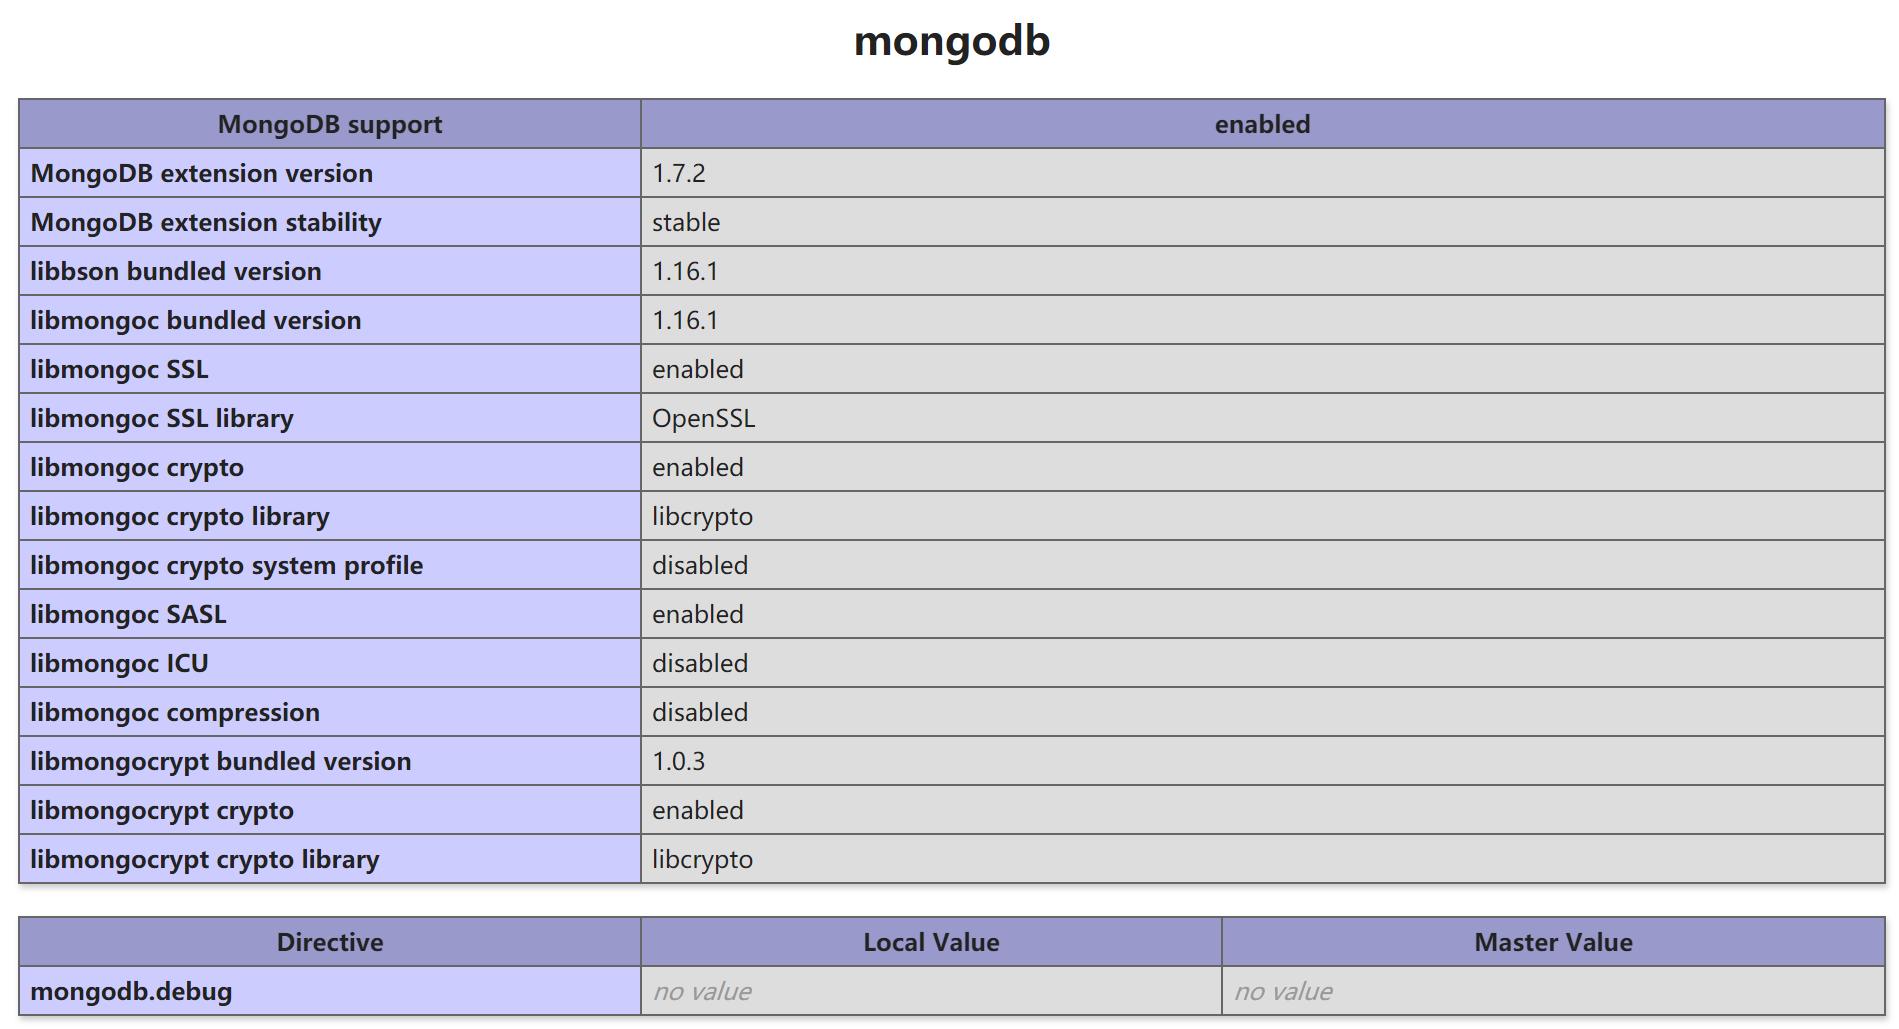 《MongoDB 面向文档数据库使用说明》